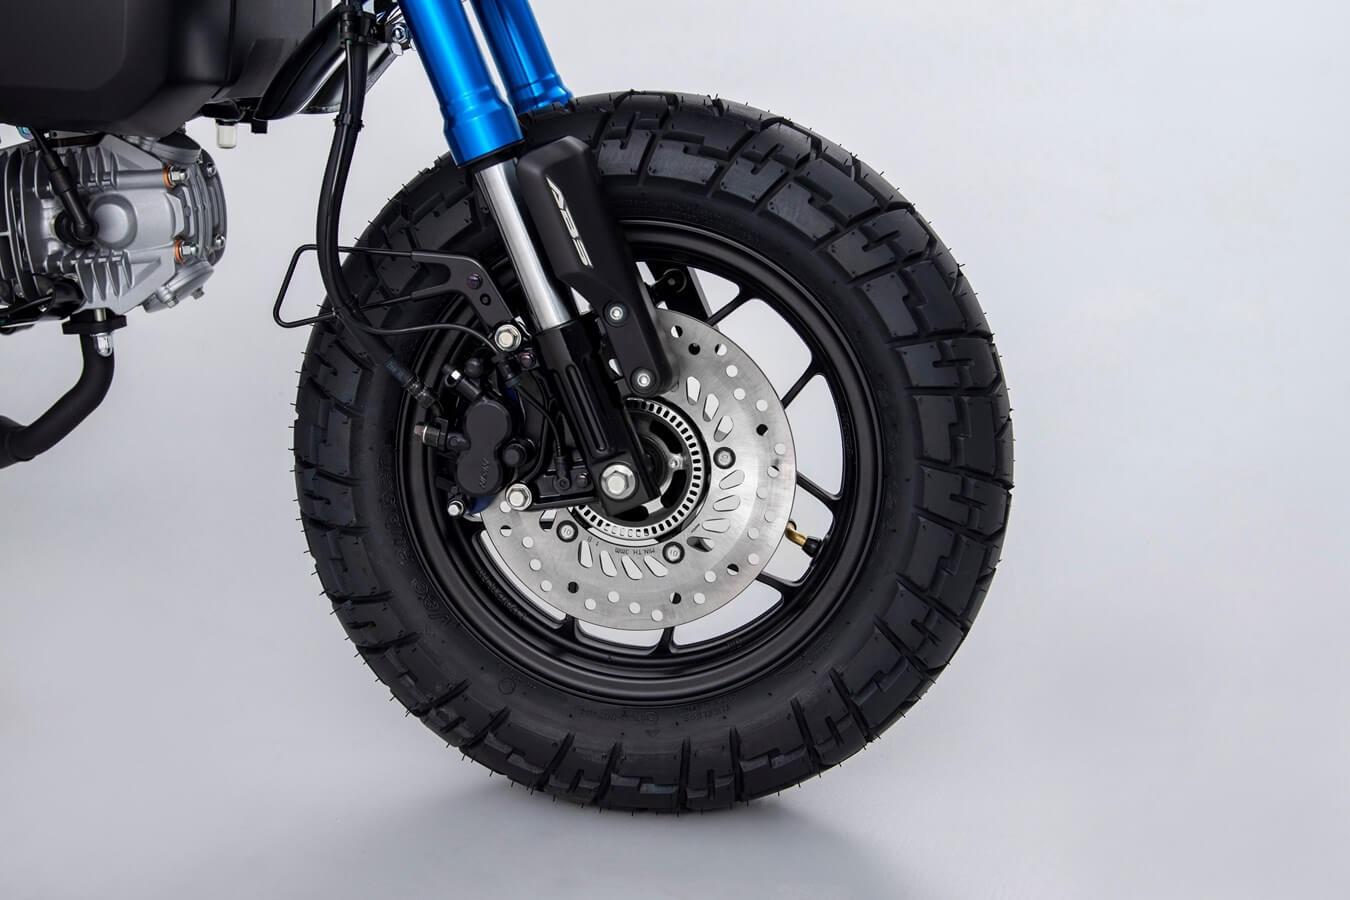 2022 Honda Monkey 125 Review, Specs, New Changes Explained + USA Information   125cc Motorcycle / Mini Bike   miniMOTO Vintage / Retro Bike